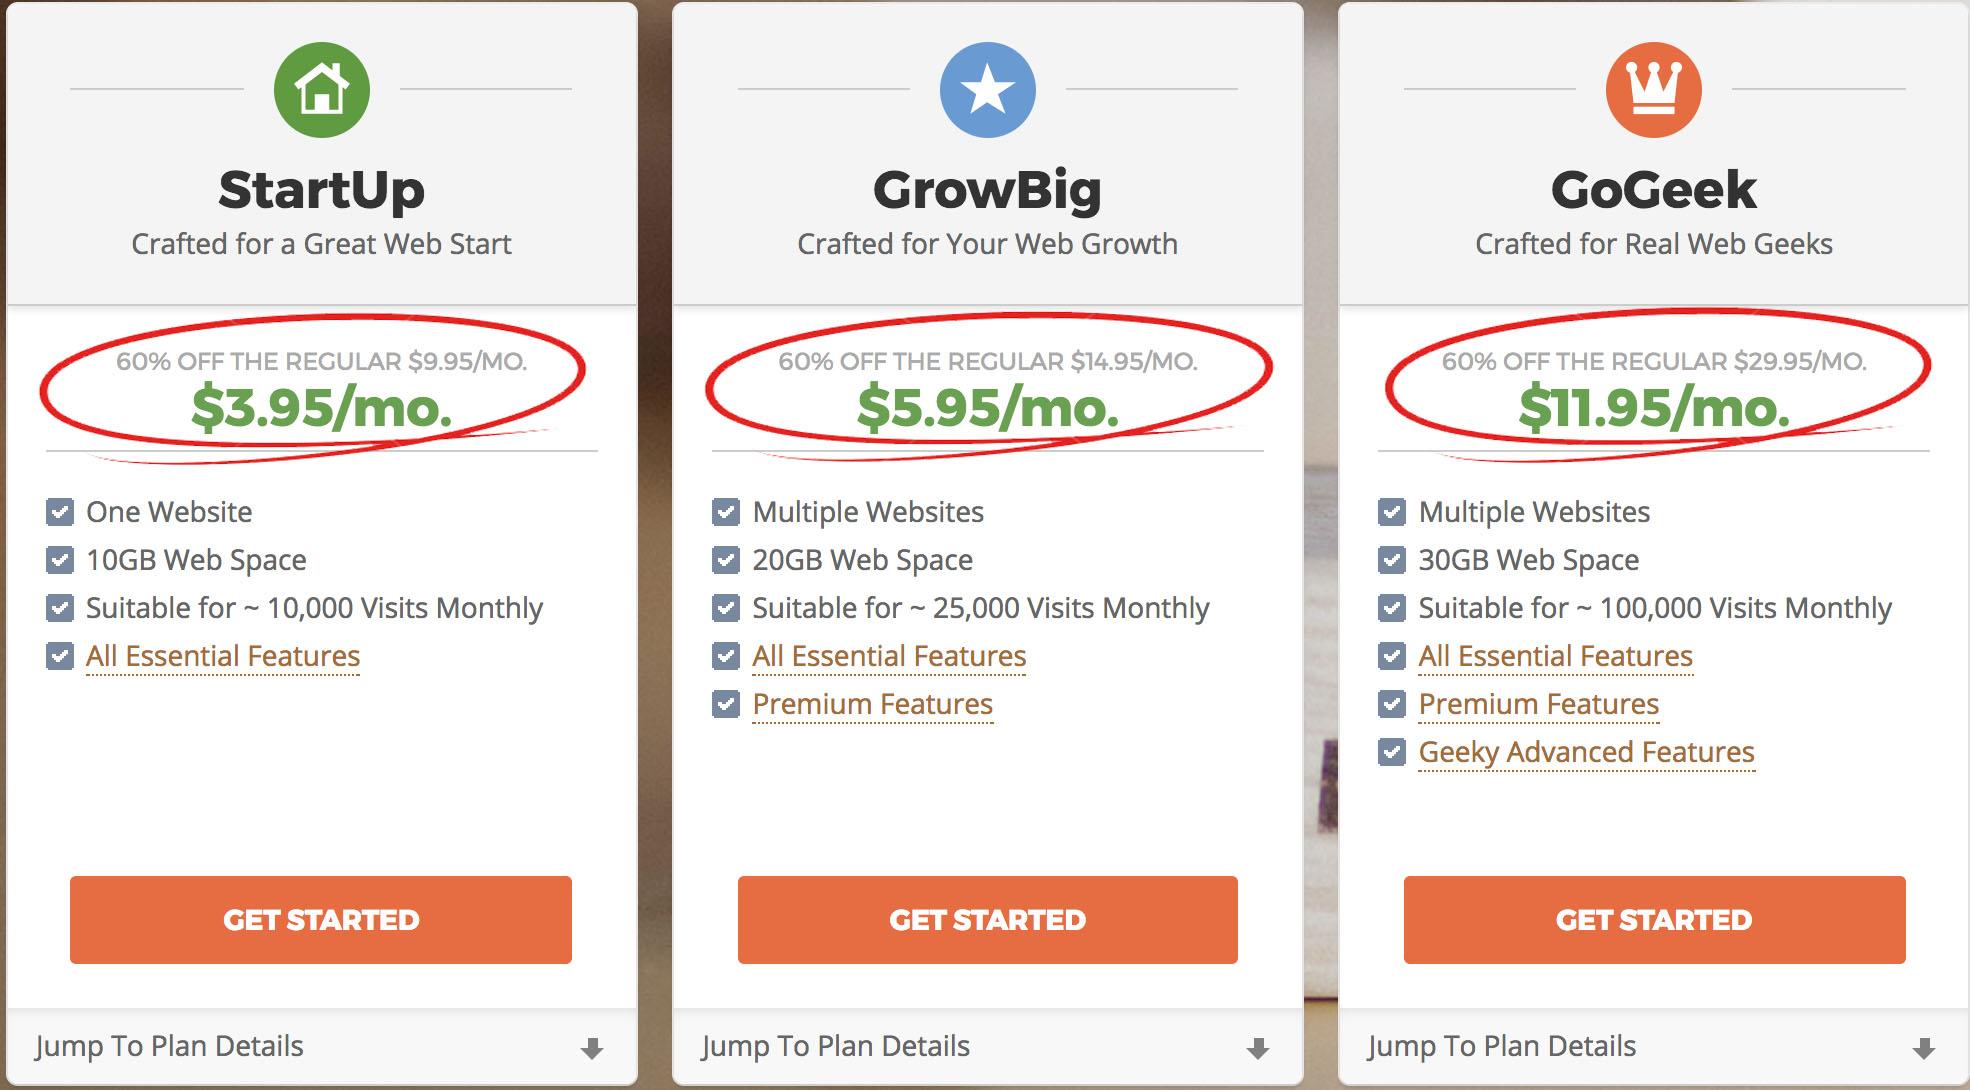 siteground coupon code, siteground discount